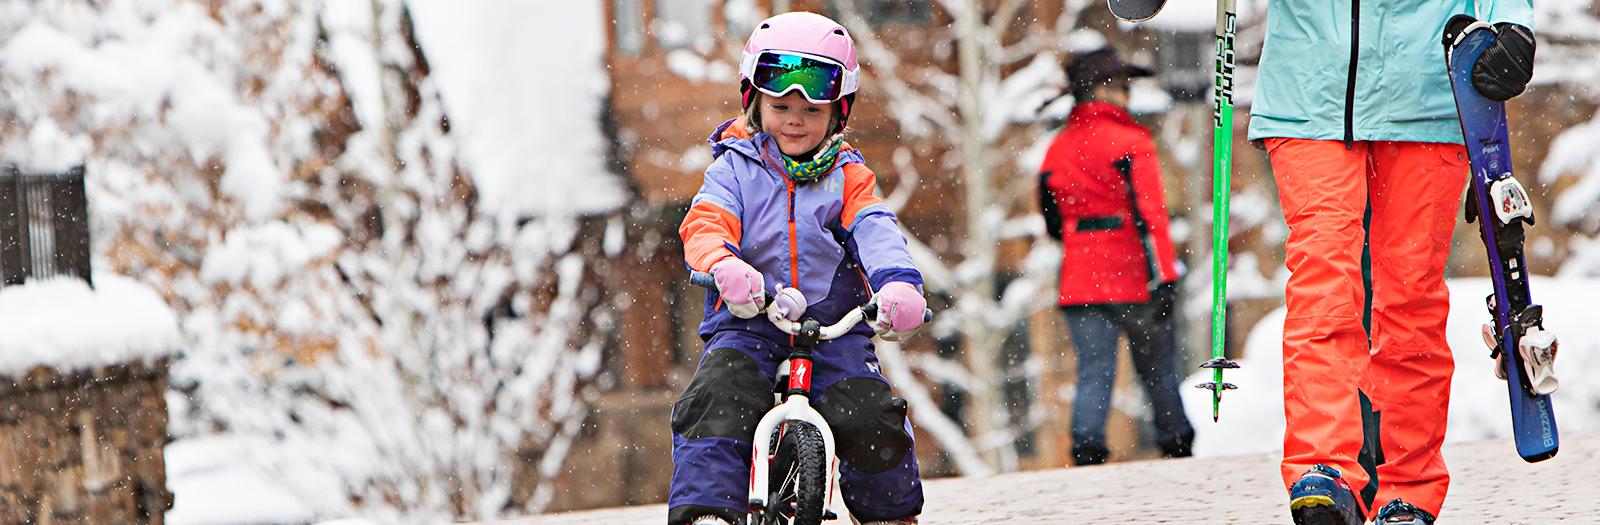 Browse lodging deals at Snowmass, Aspen Snowmass, vacation rentals, hotels